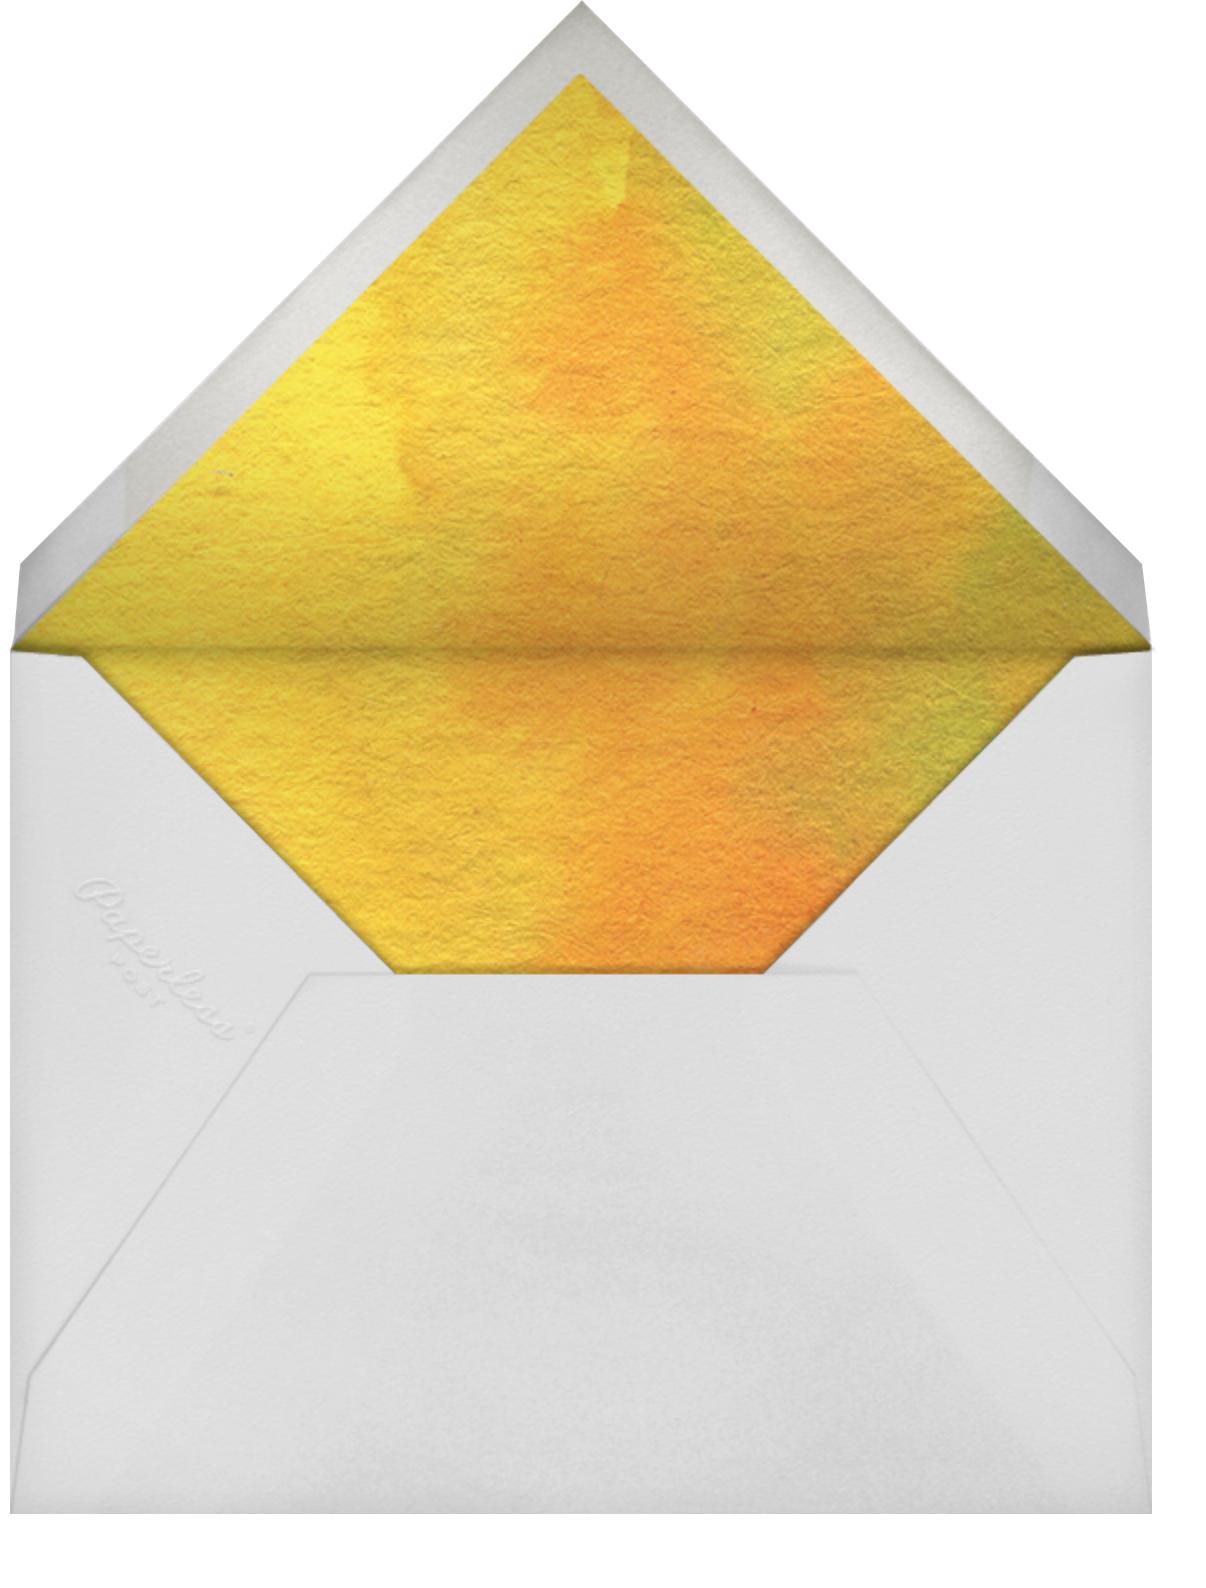 Autumn Tree - Felix Doolittle - Envelope